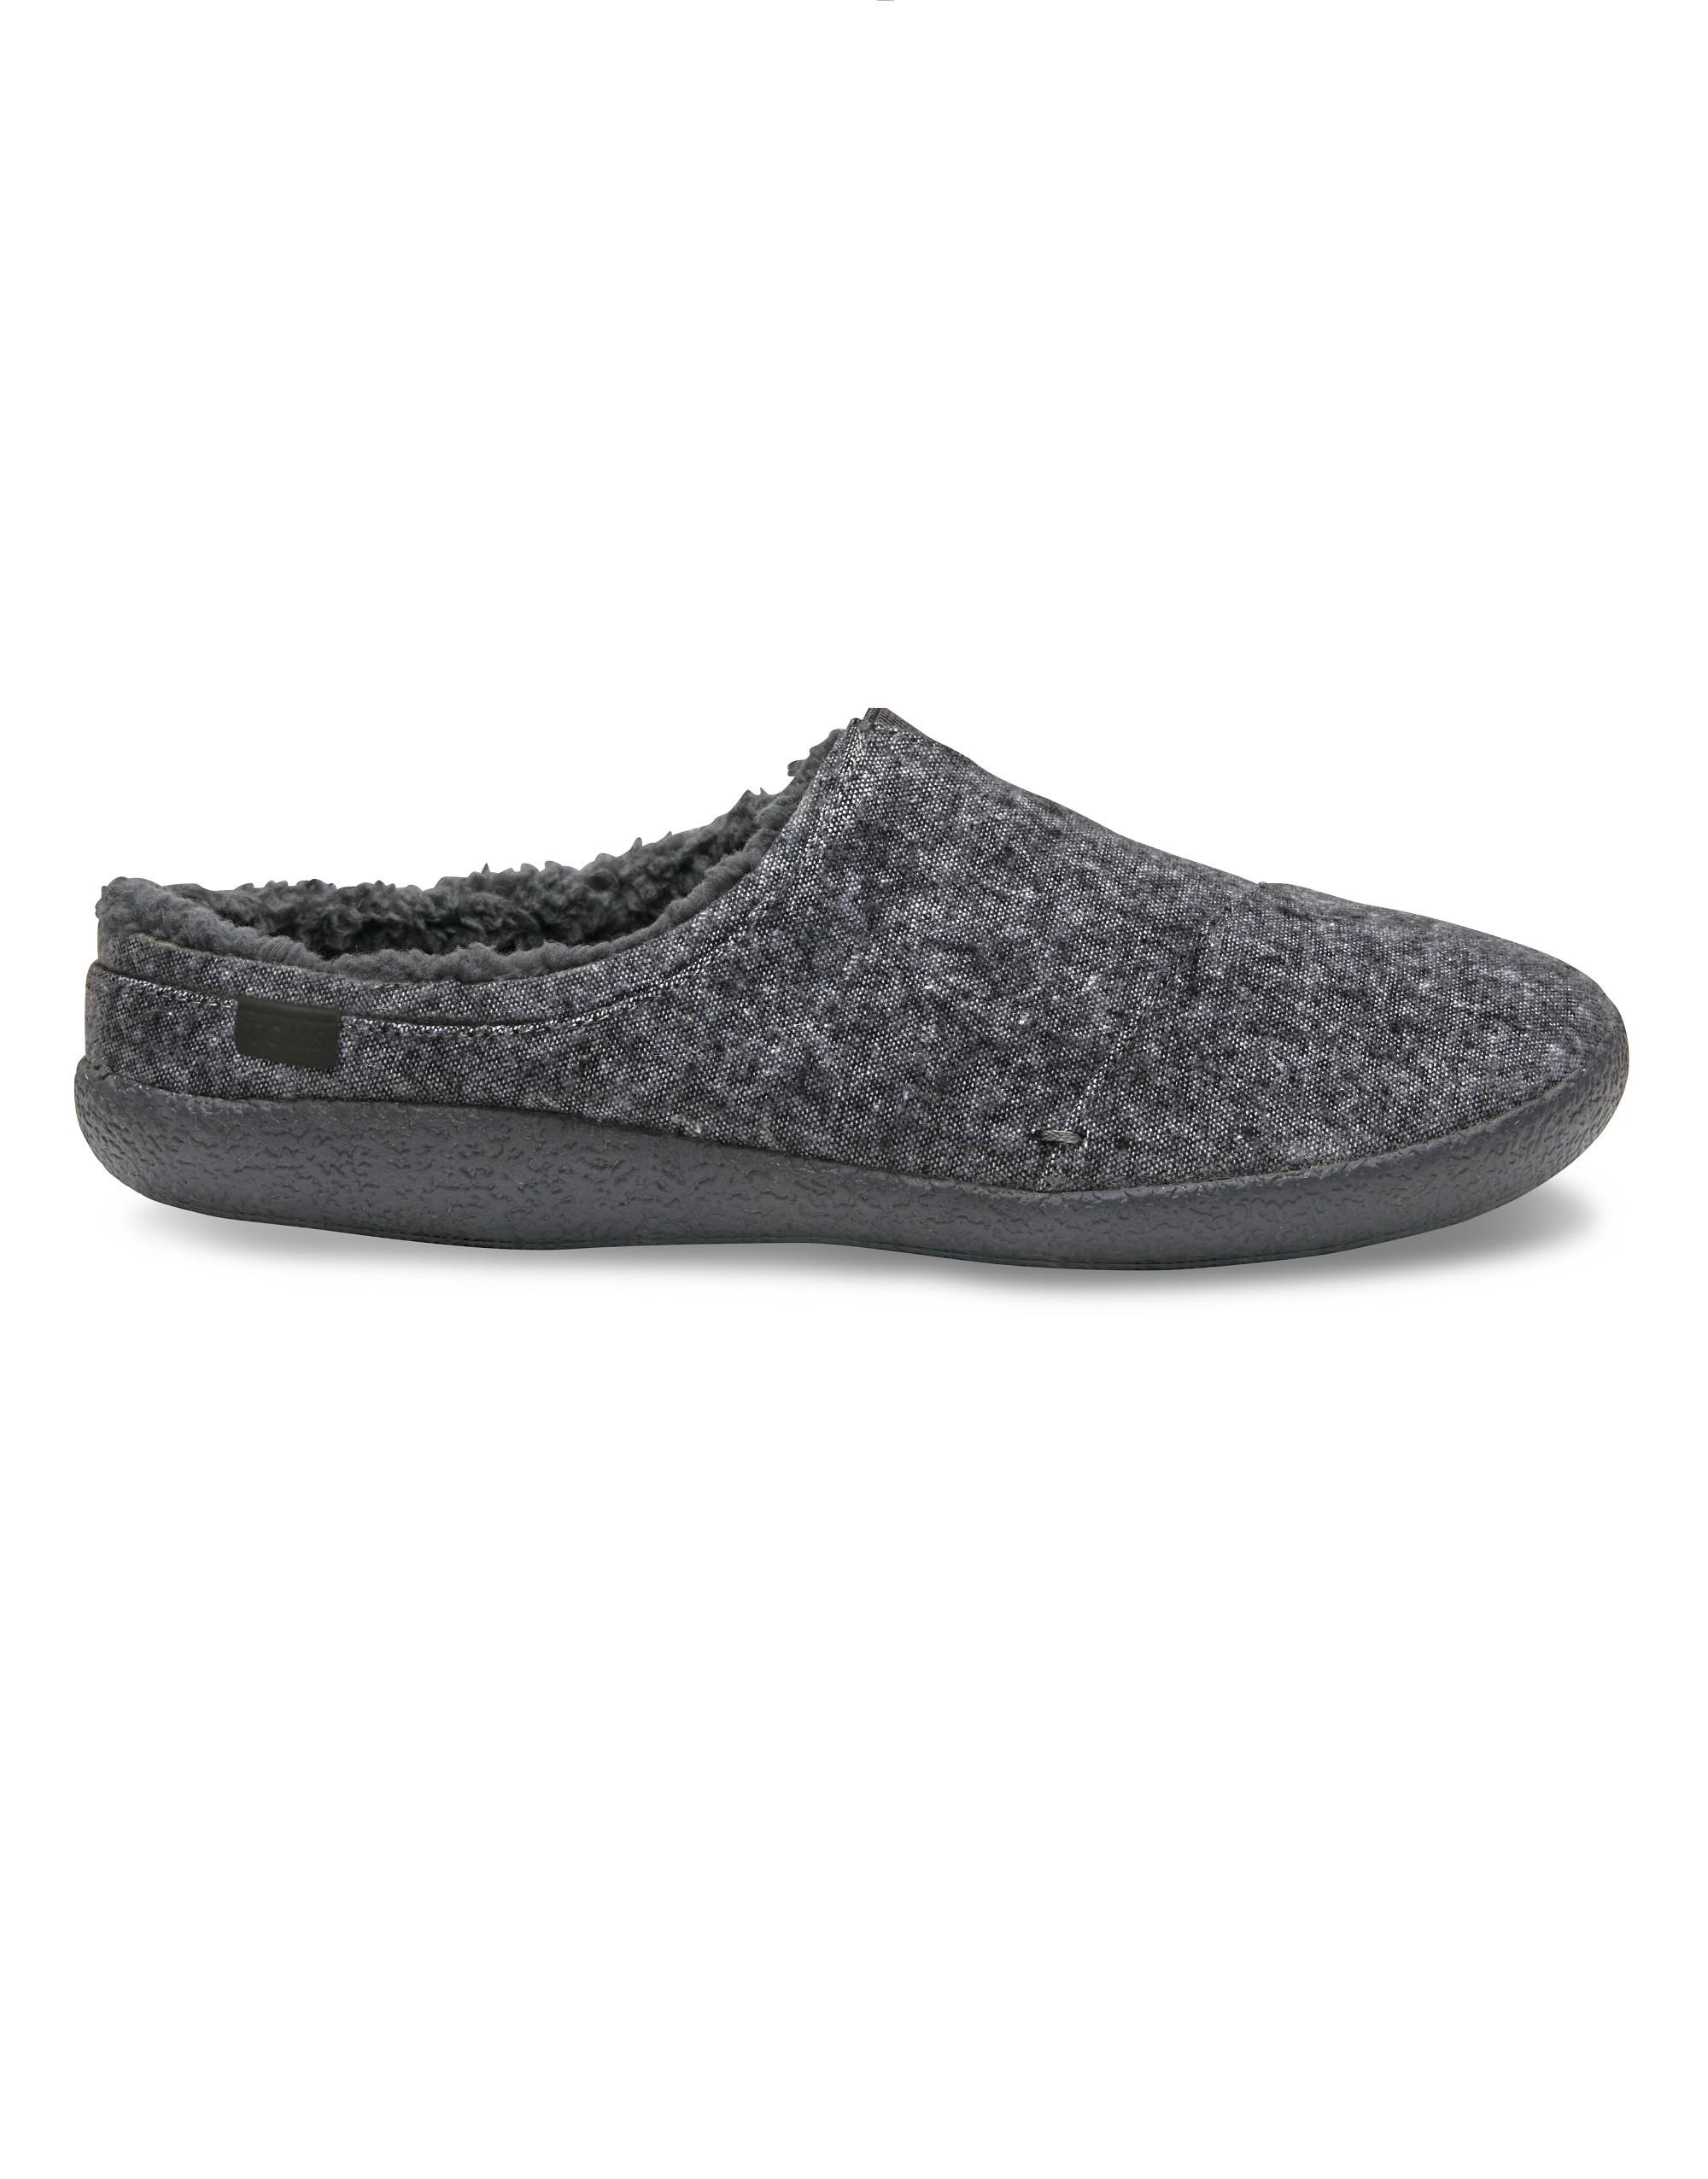 Toms Berkeley Slippers Grey Slub | Country Attire